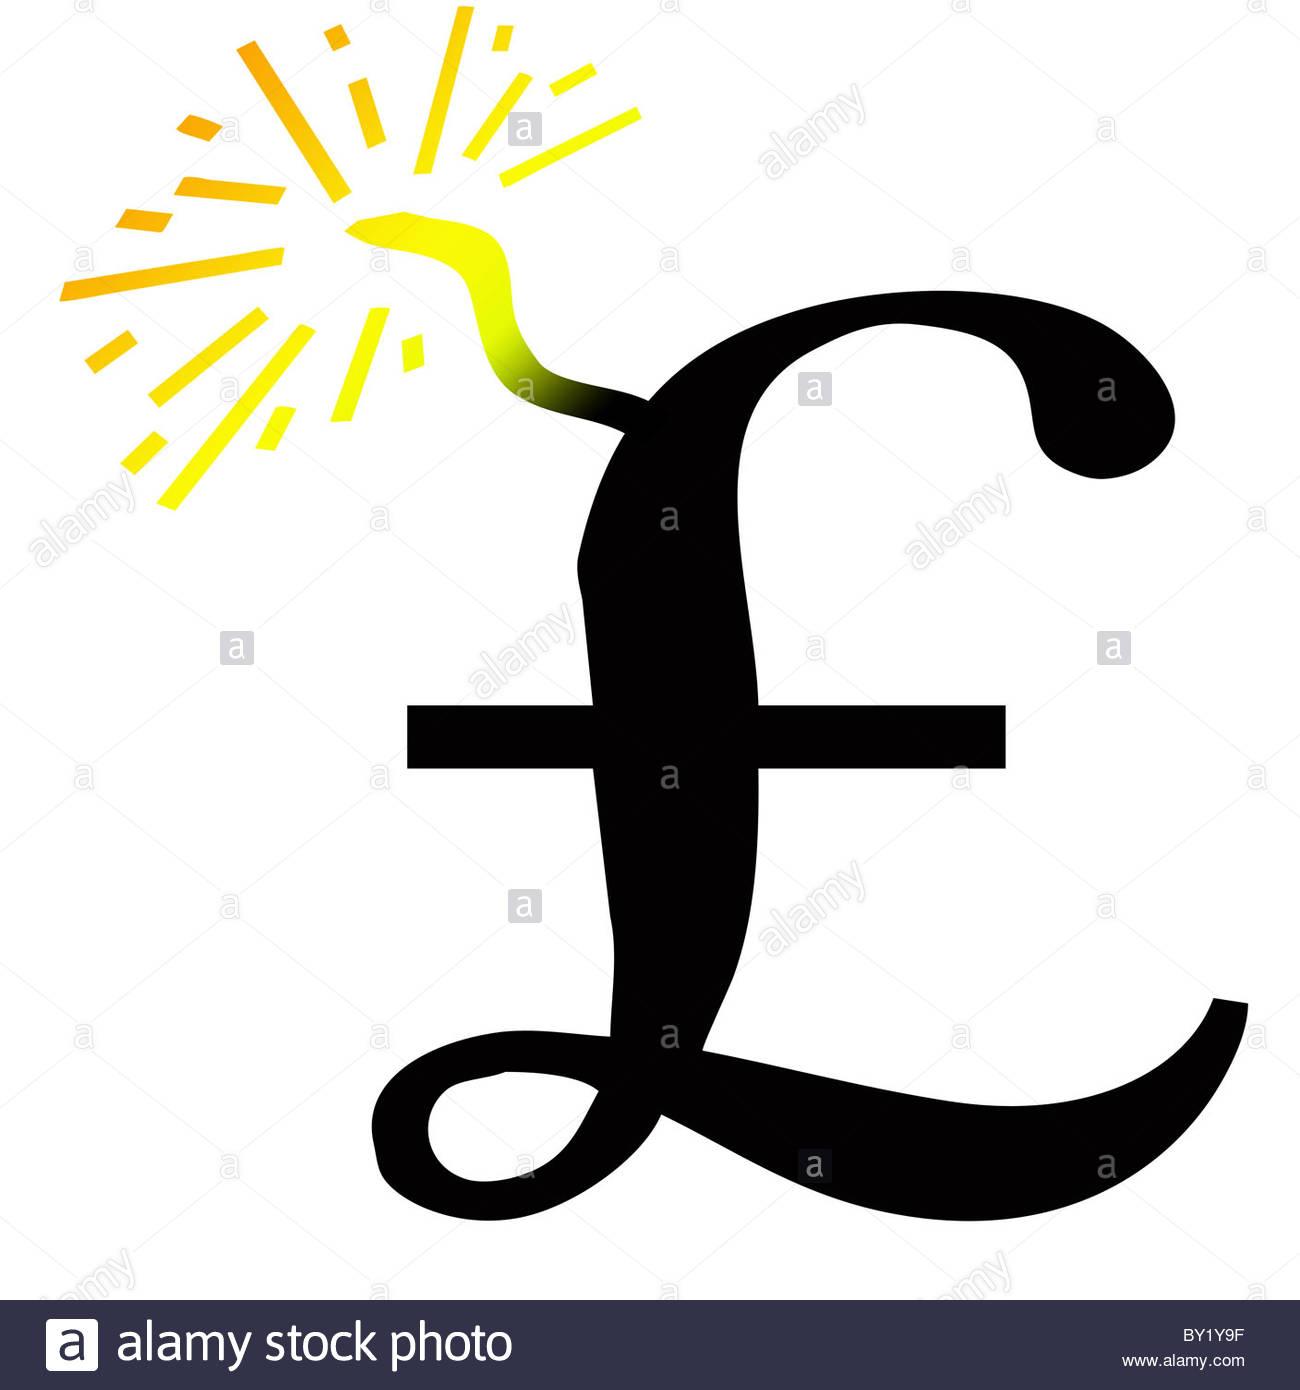 Pound Symbol Cut Stock Photos Pound Symbol Cut Stock Images Alamy